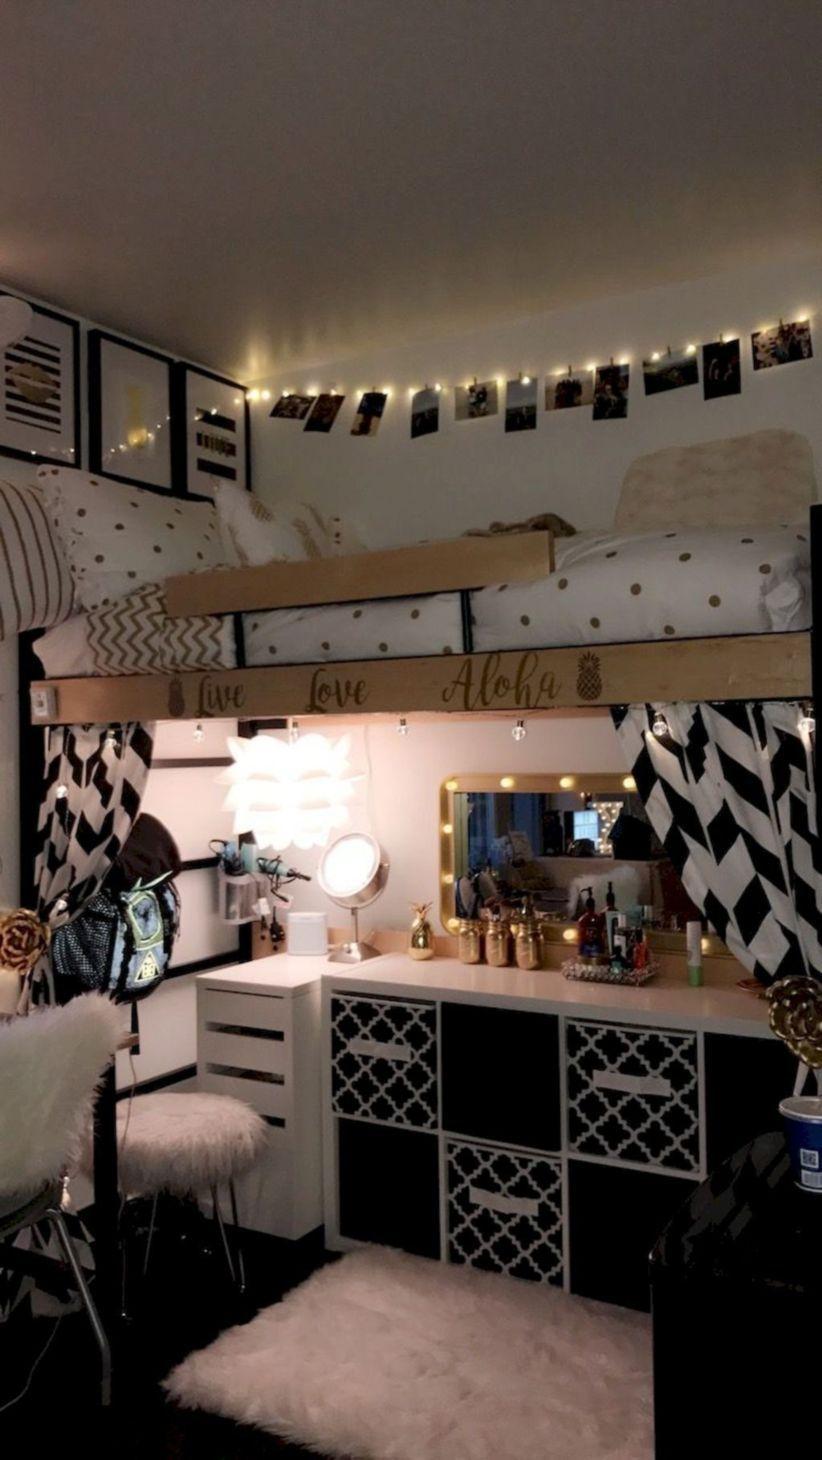 47 Incredible Diy Projects Dorm Room Design Ideas Dorm Room